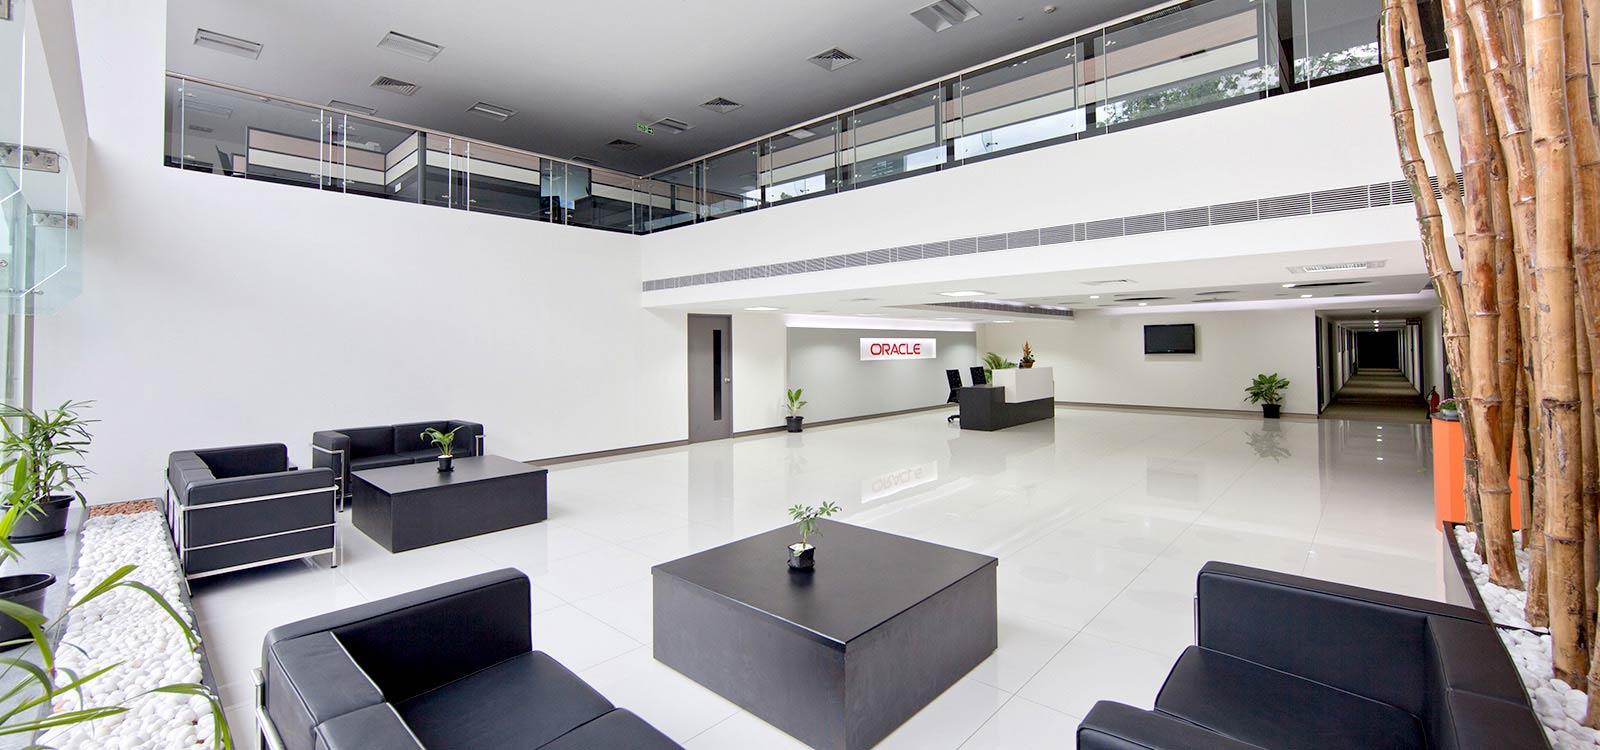 Architetcural Consultancy Services